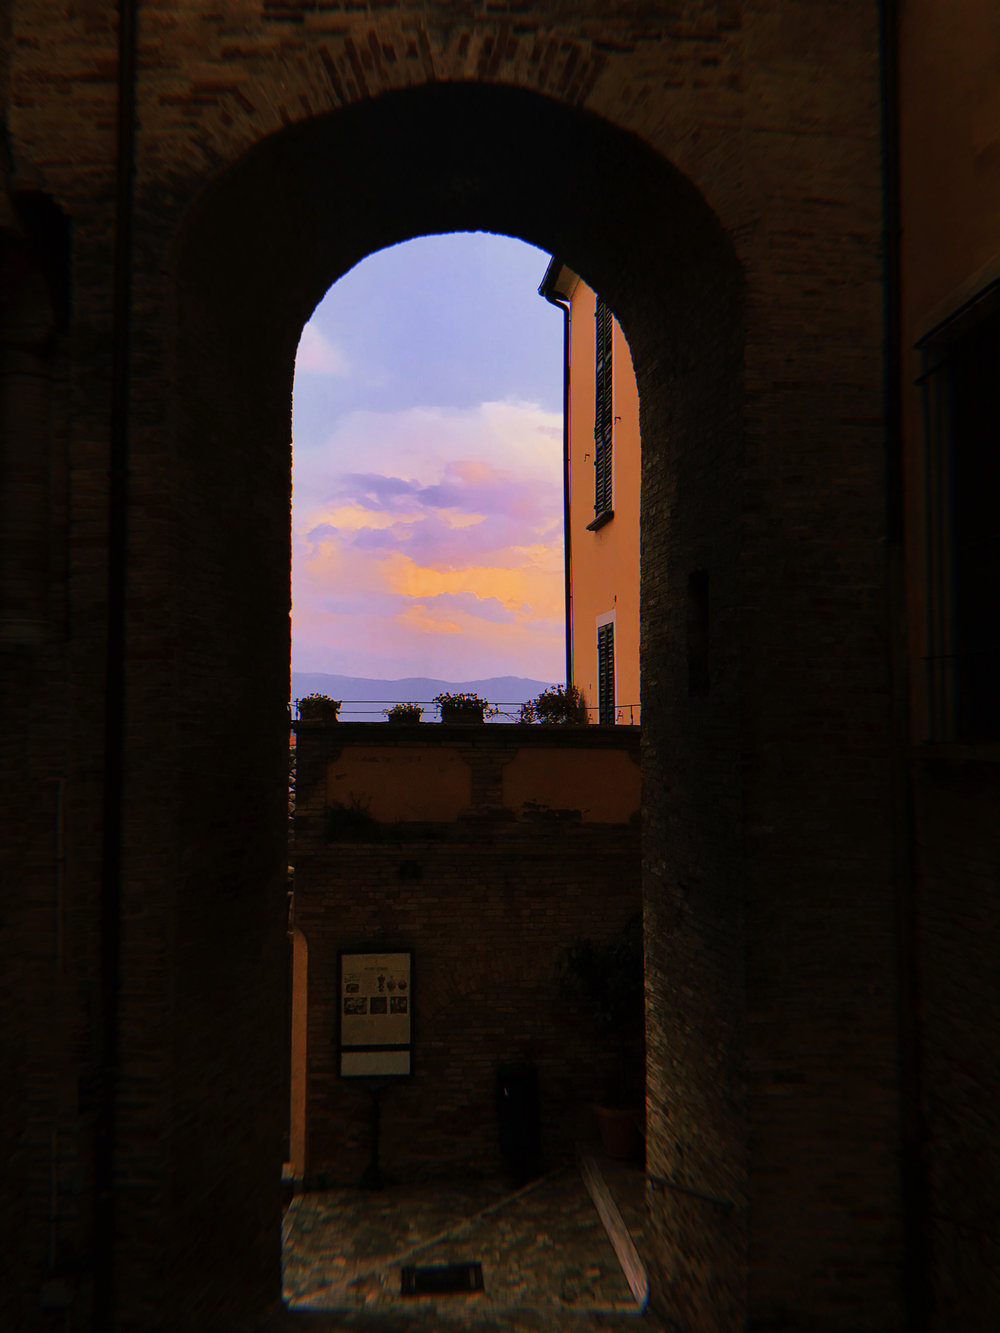 Collecorvino, Abruzzo, Italy